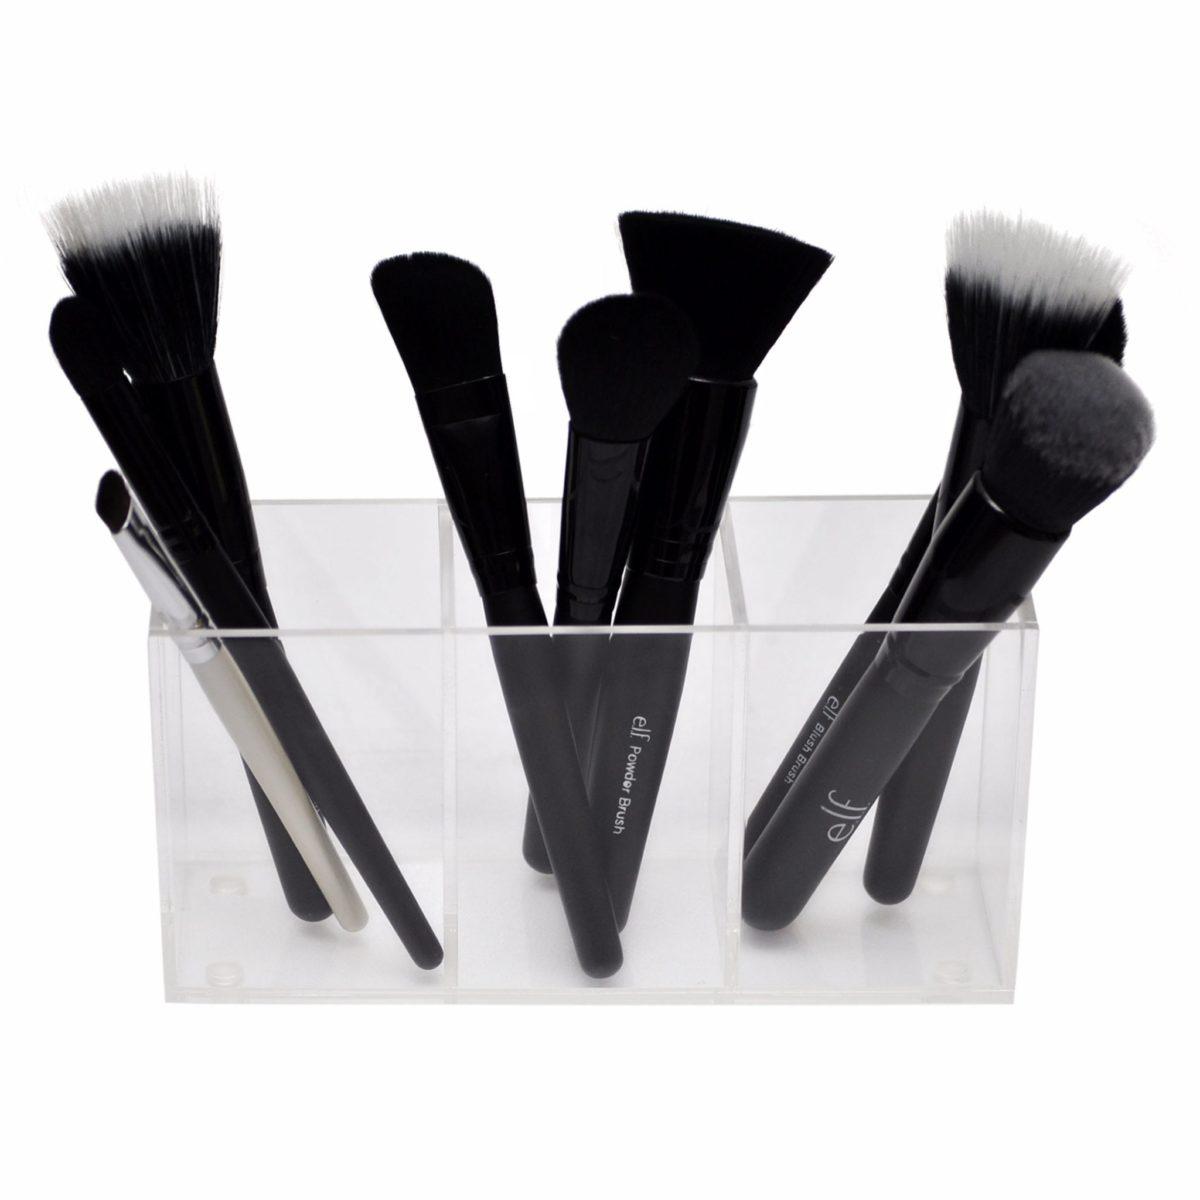 3 compartment brush holder